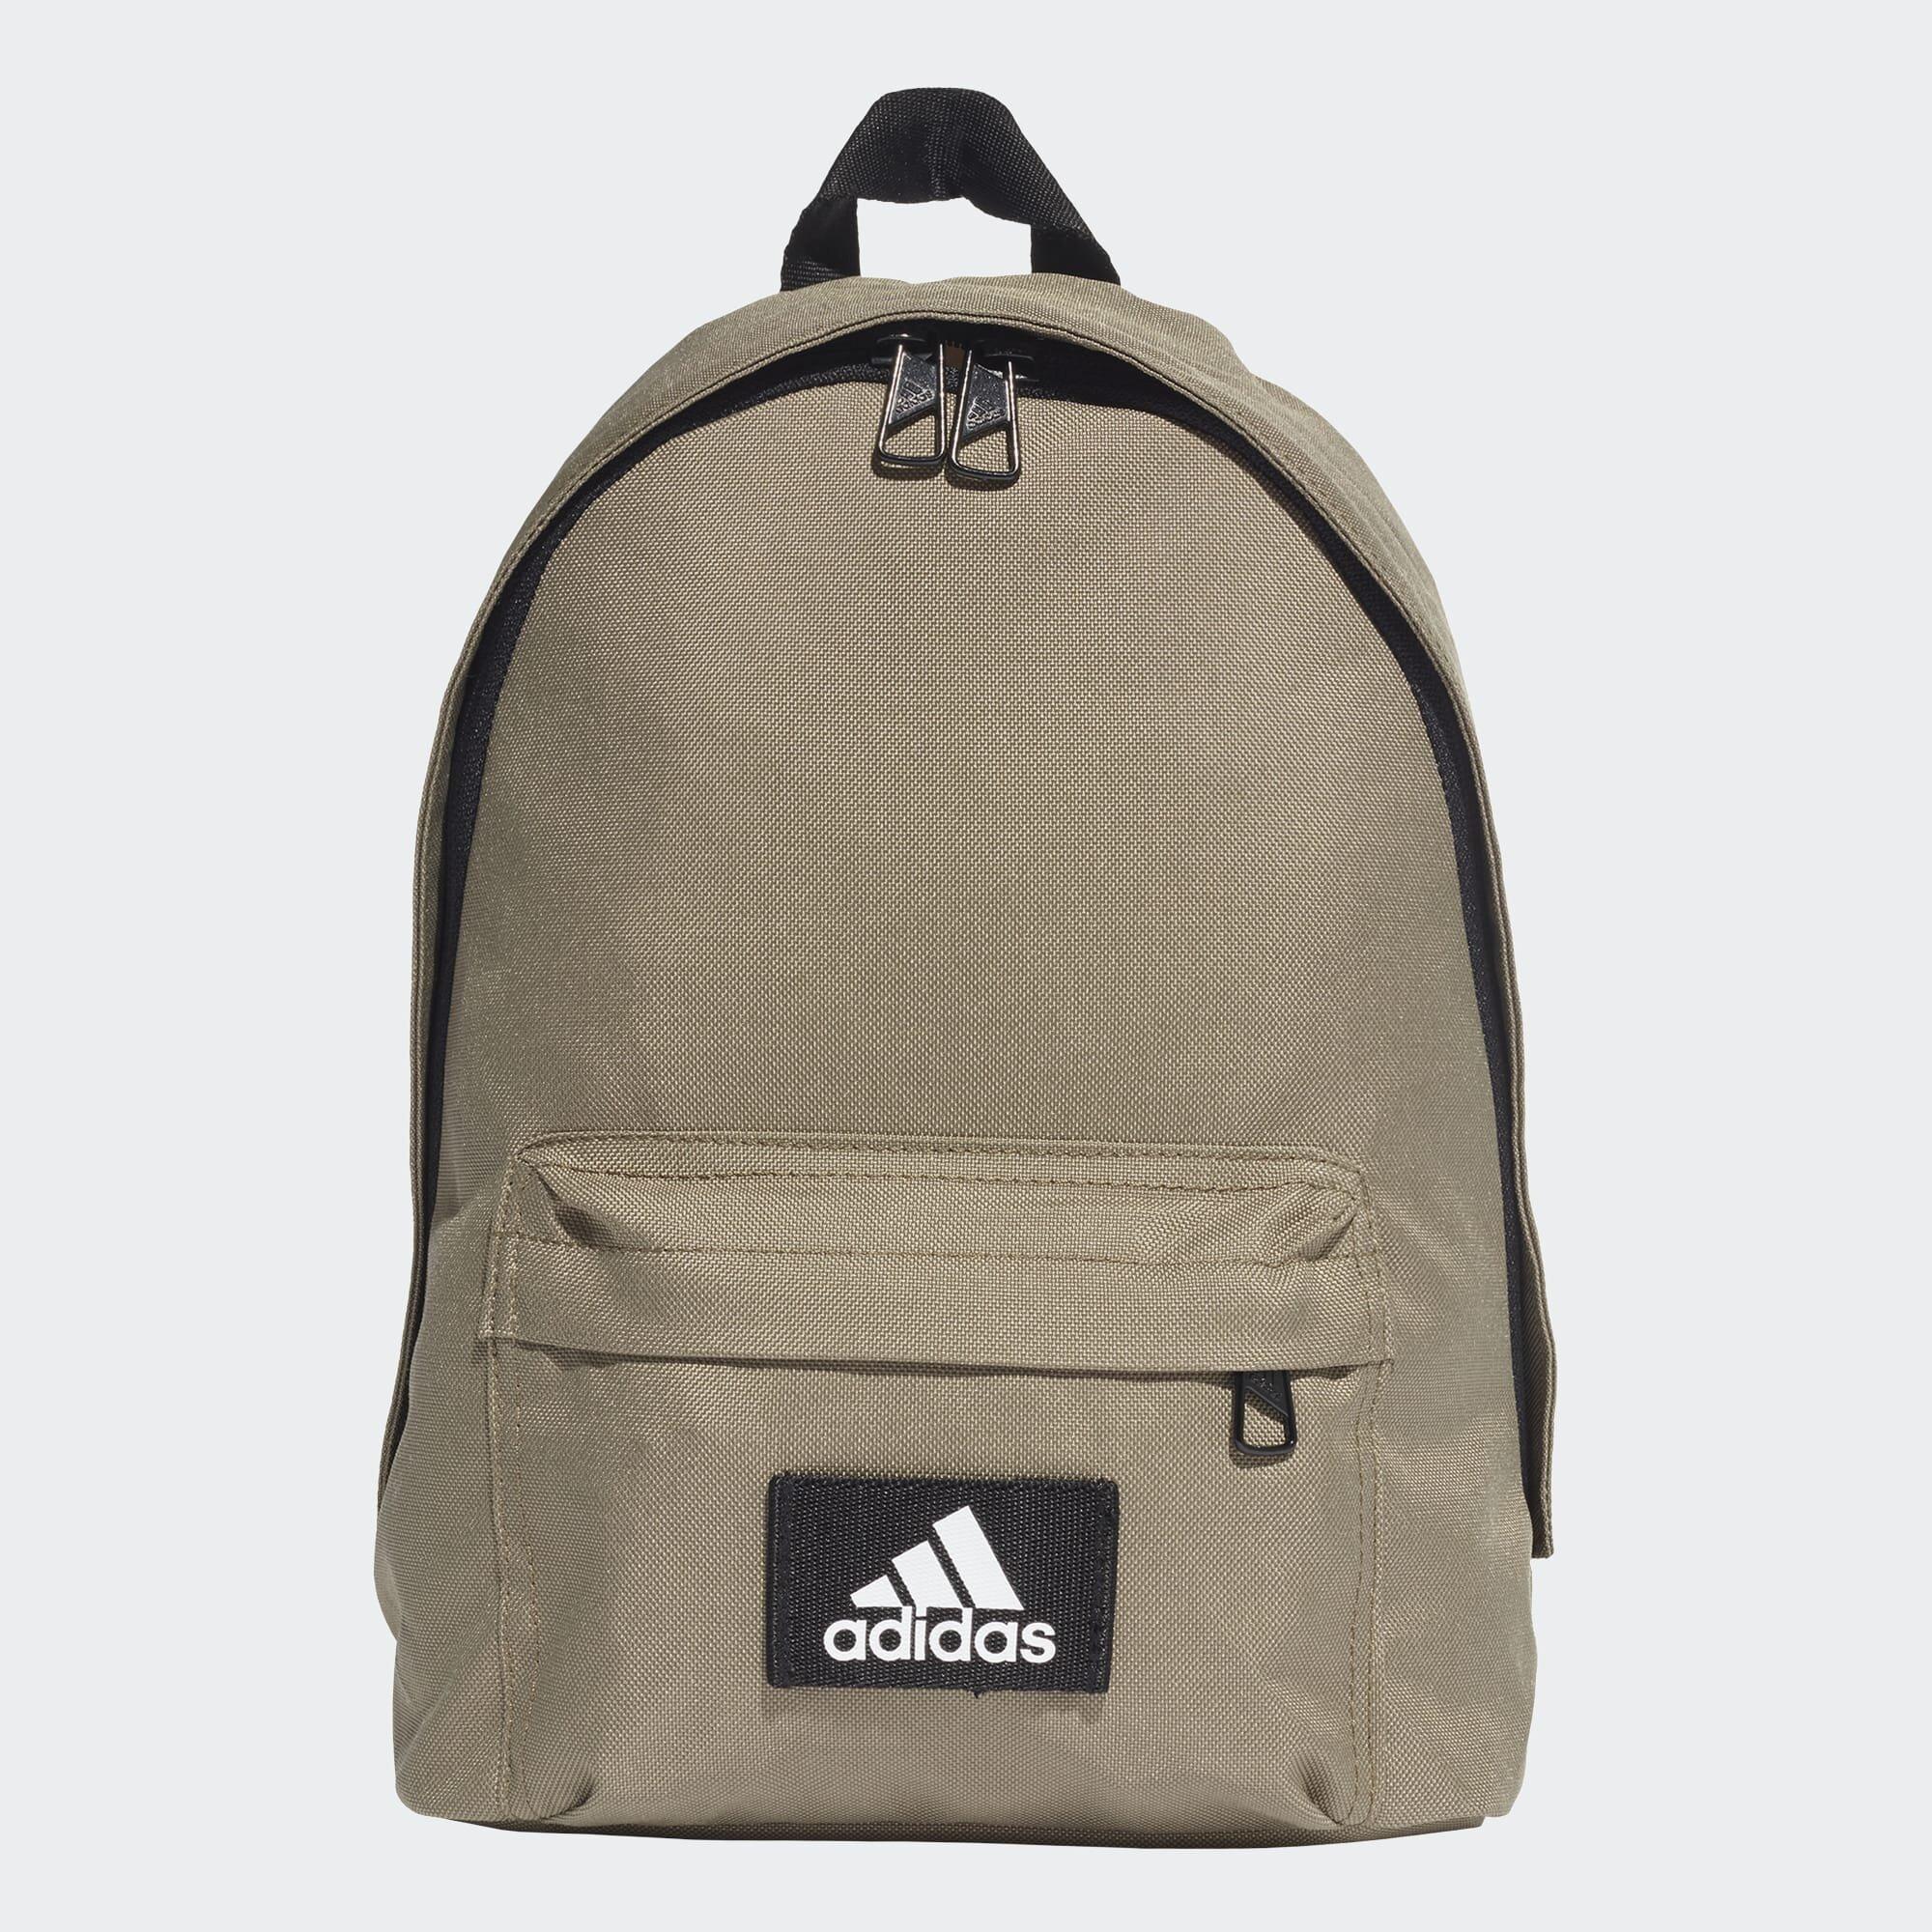 adidas Essential Soccer backpack grey